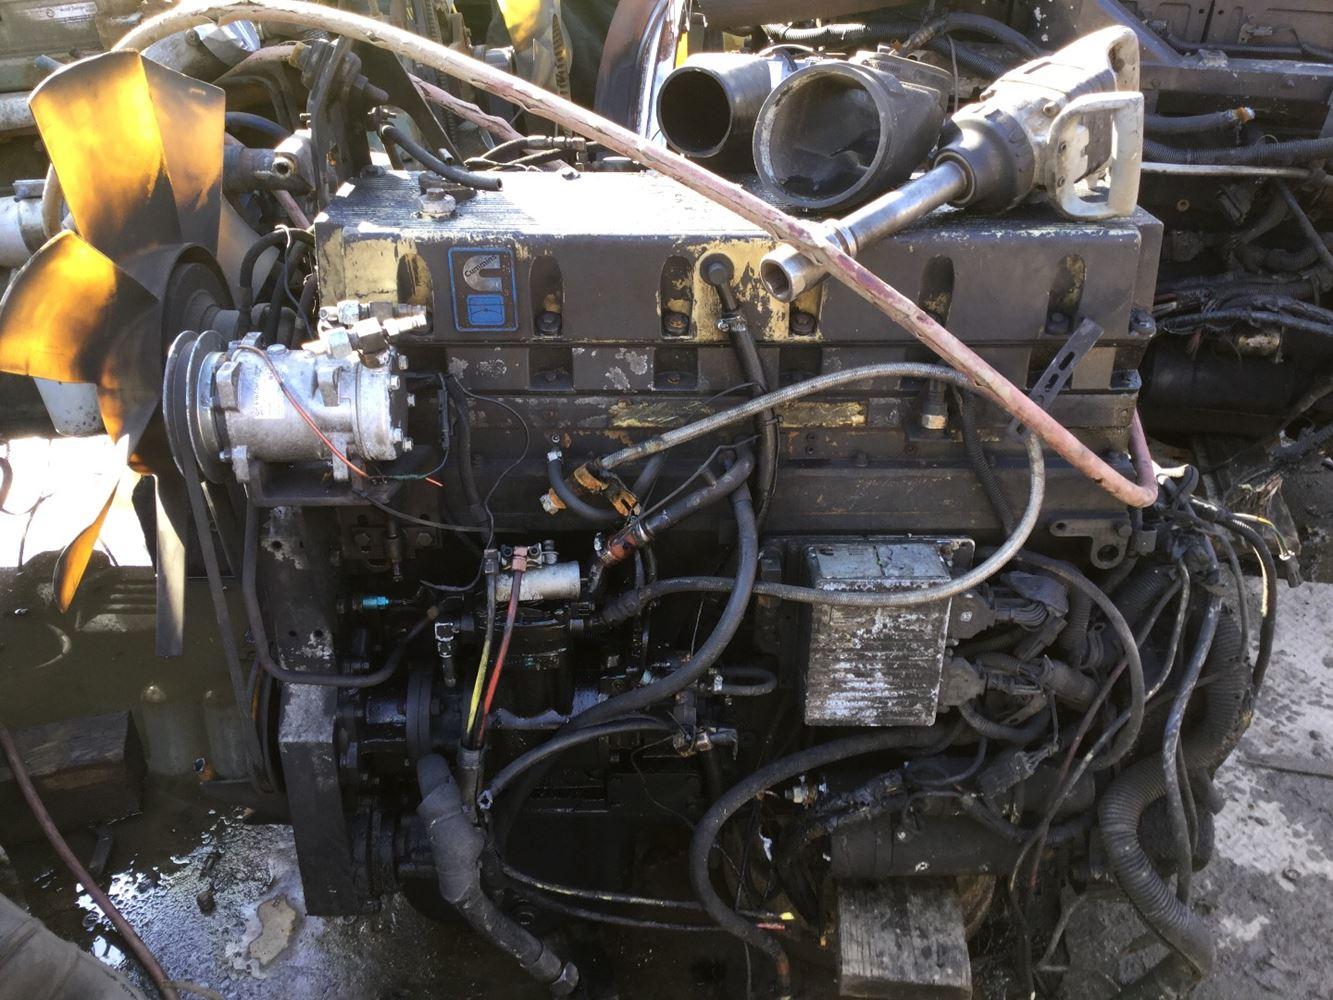 1993 Cummins L10 (Stock #T-SALVAGE-1500-CUE-2780) | Engine